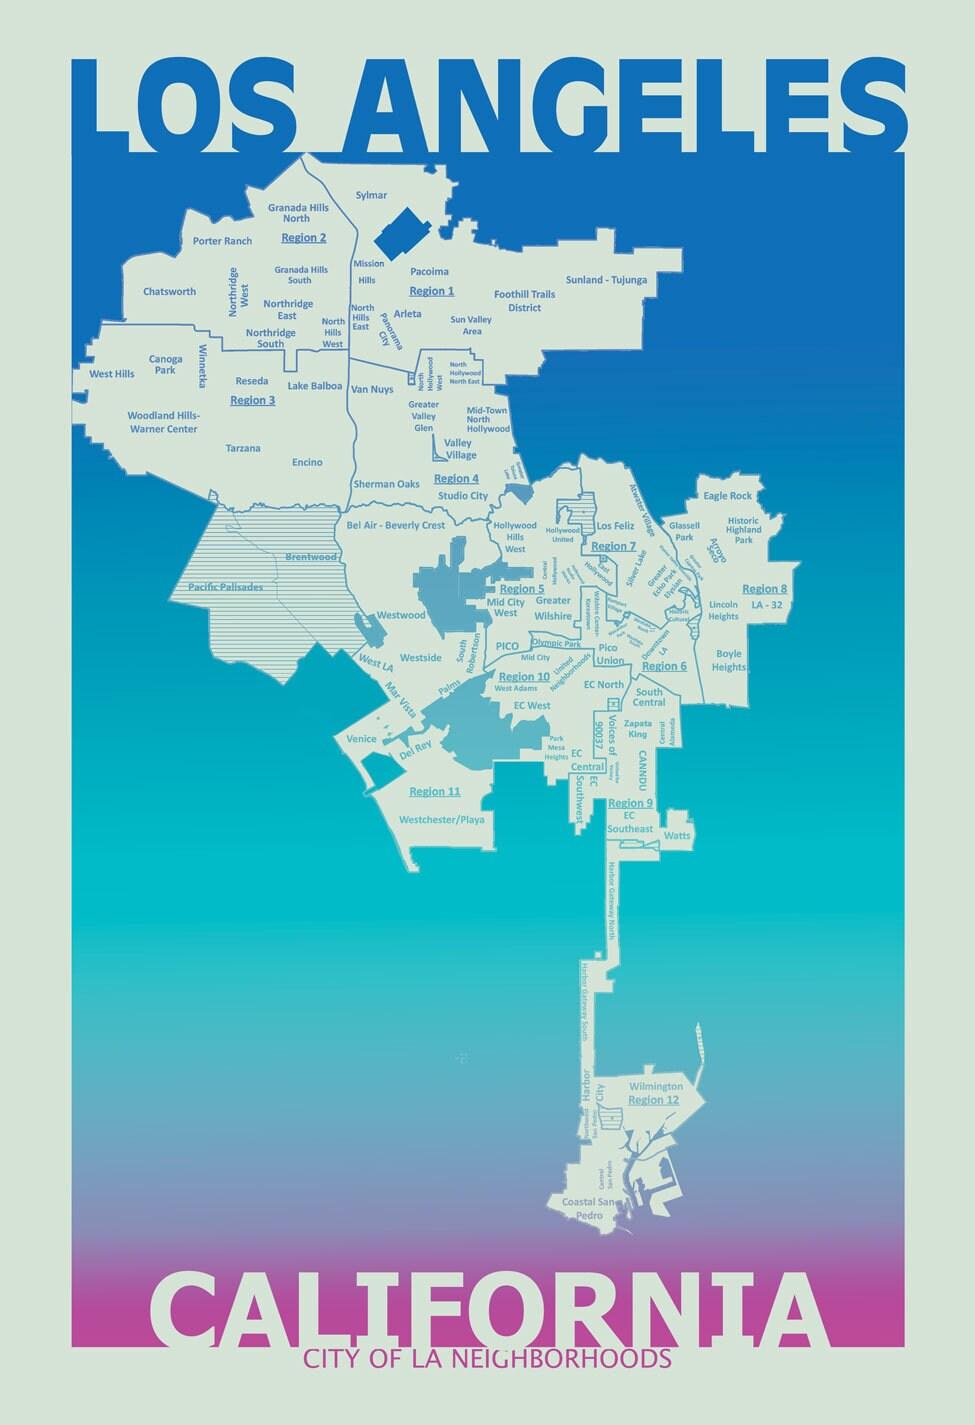 Los Angeles California Neighborhood Map Poster